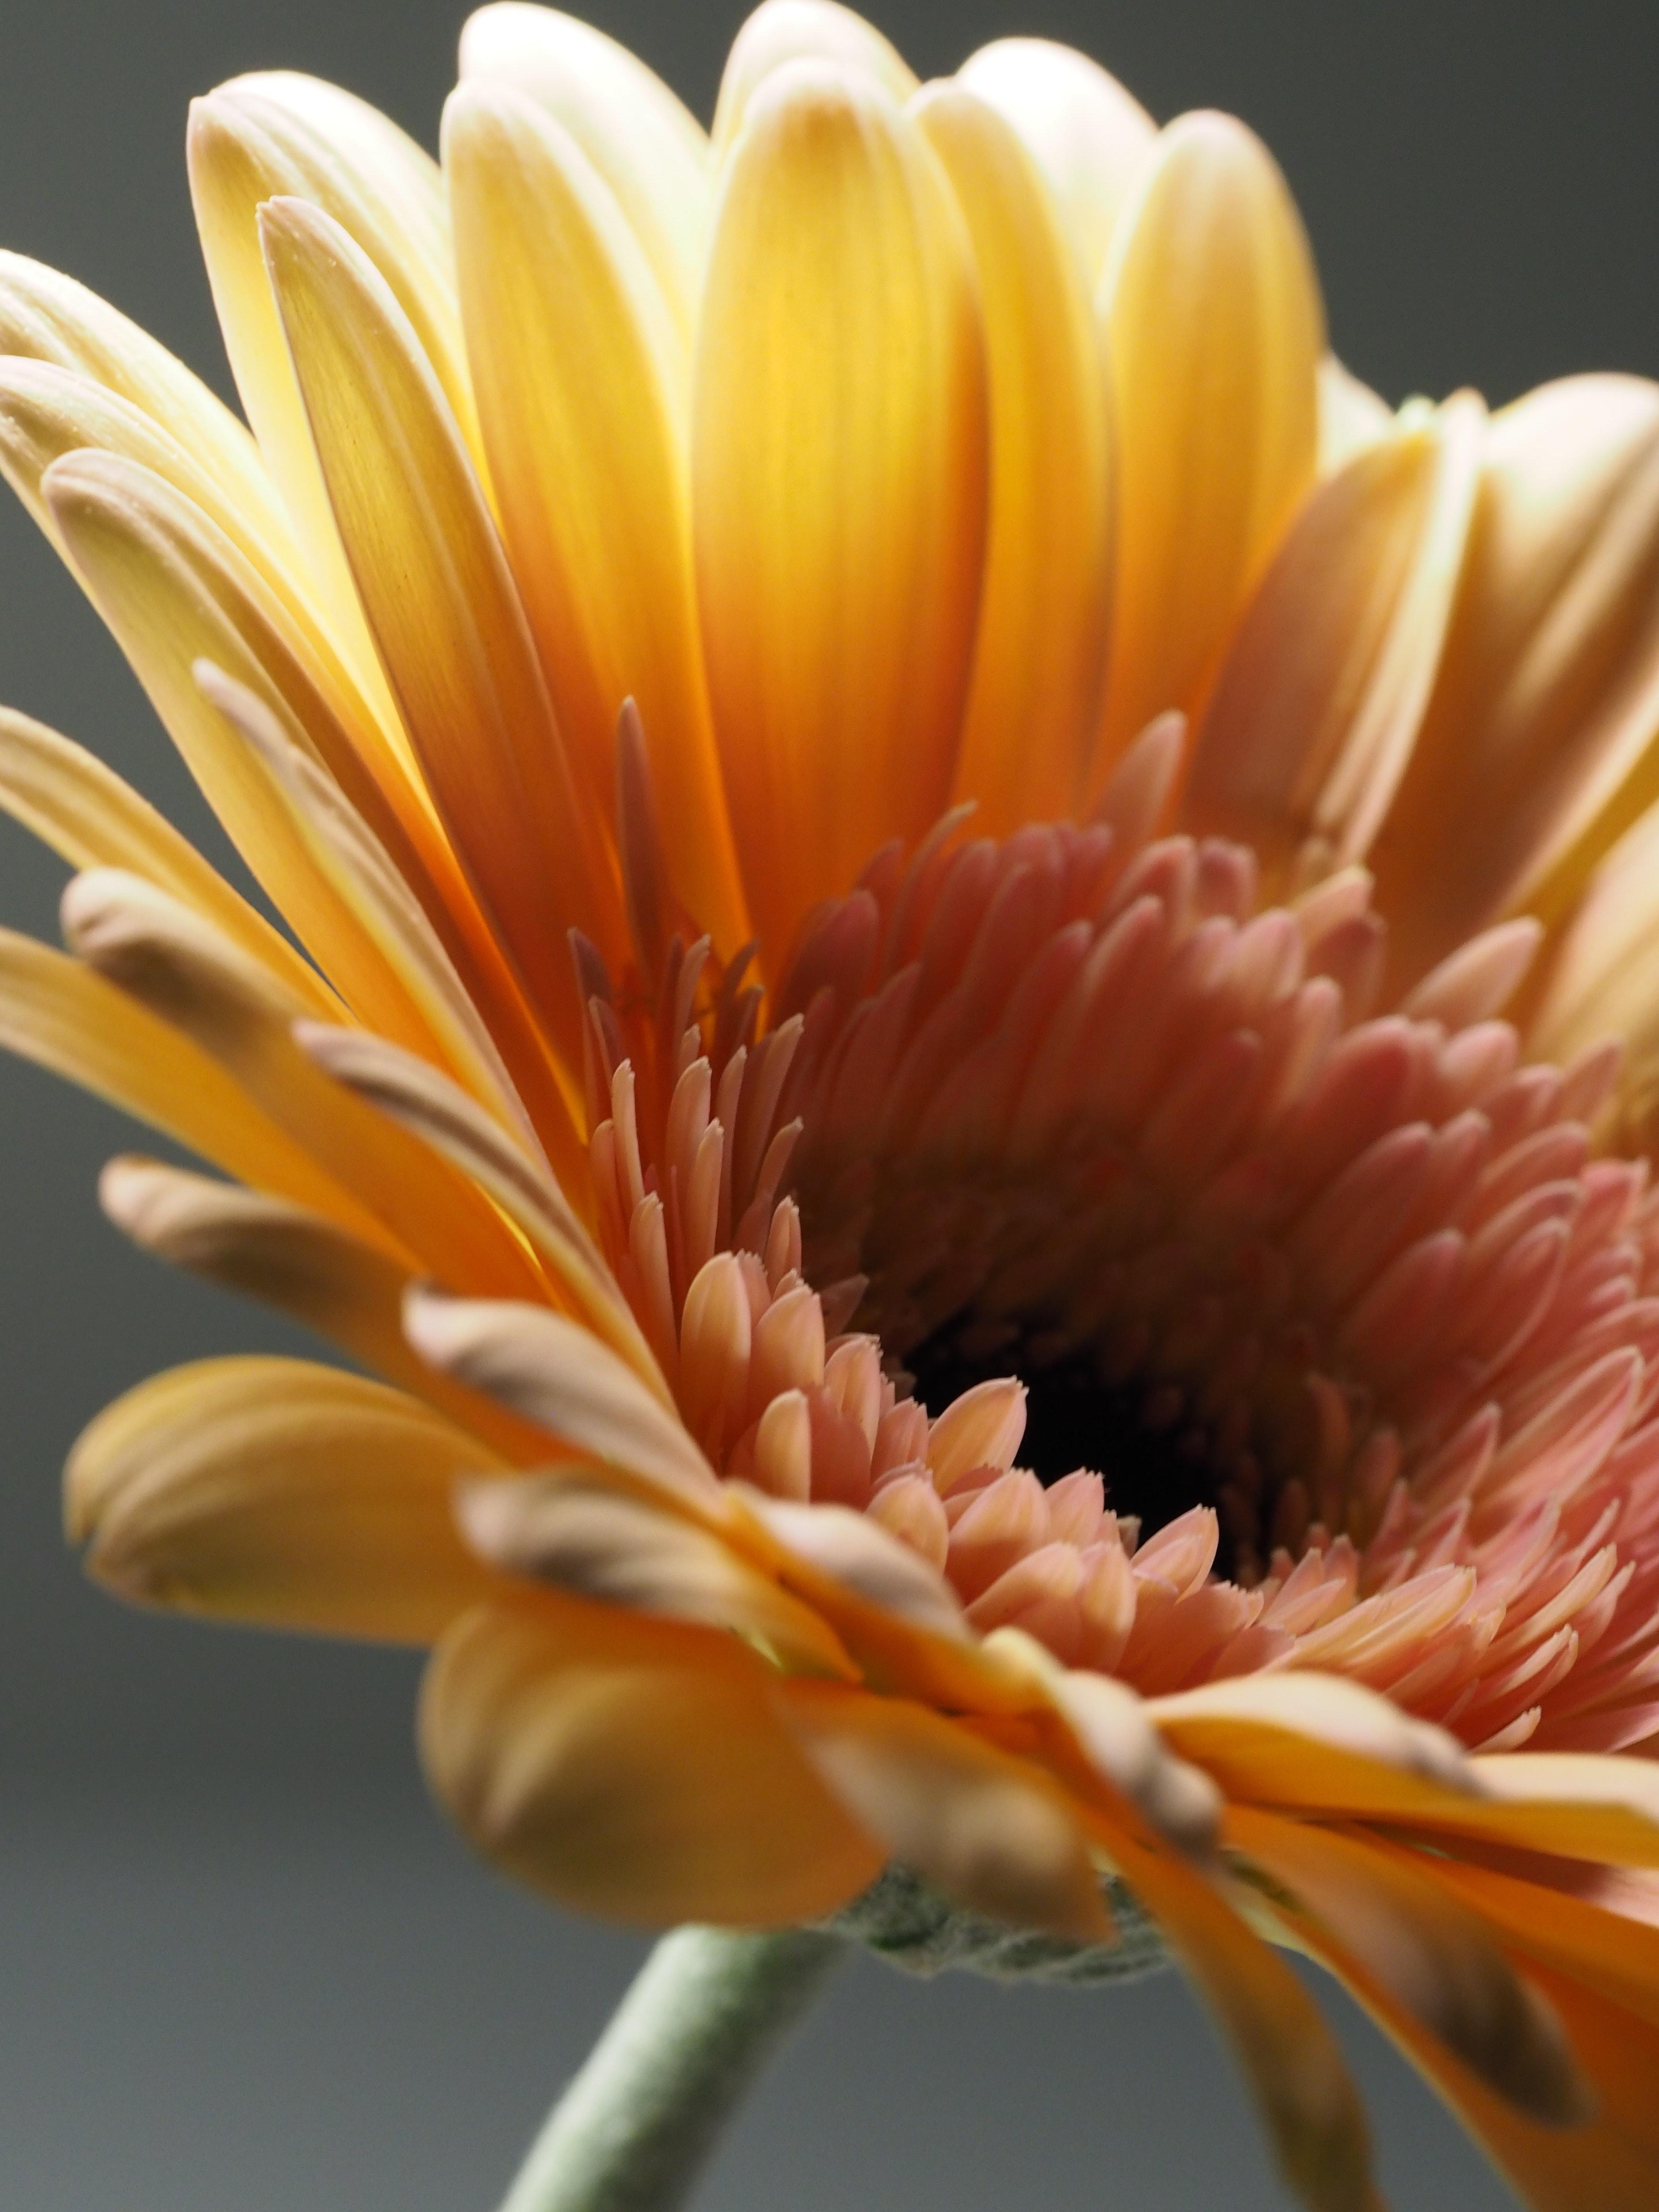 Macro photography of yellow gerbera flower